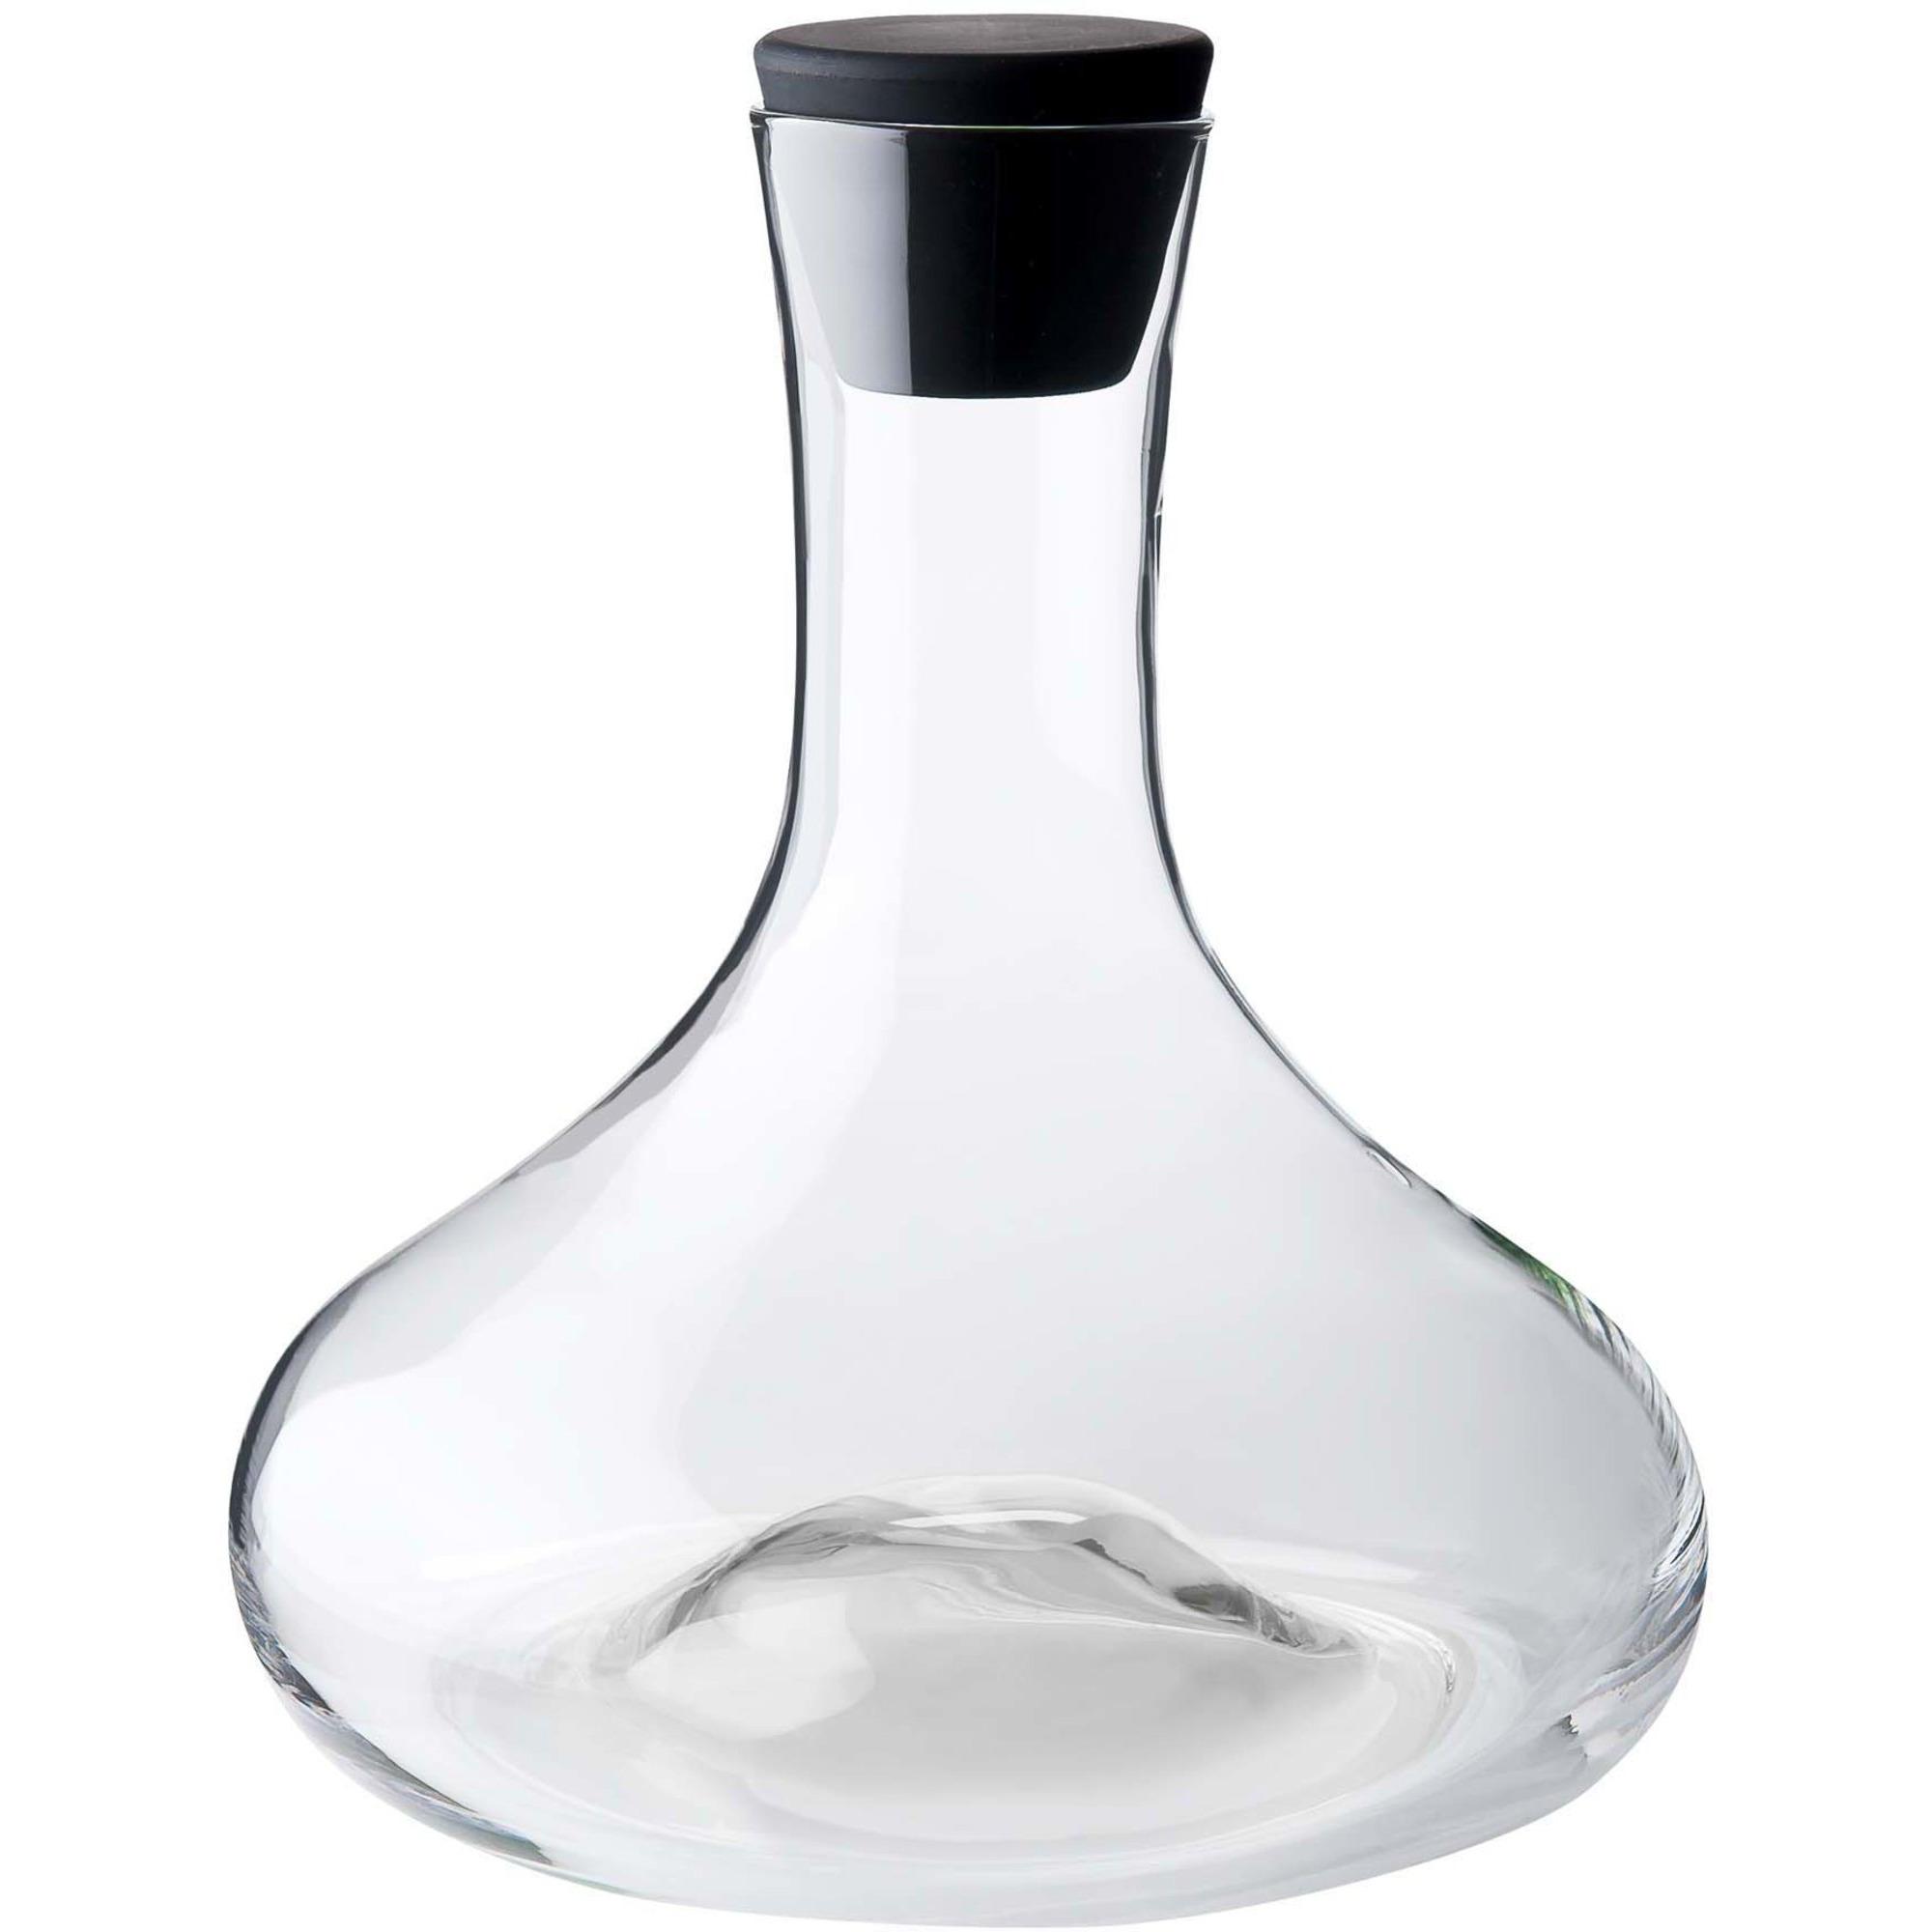 Dorre Vindekanter glas klar silikon propp rymd 20 L